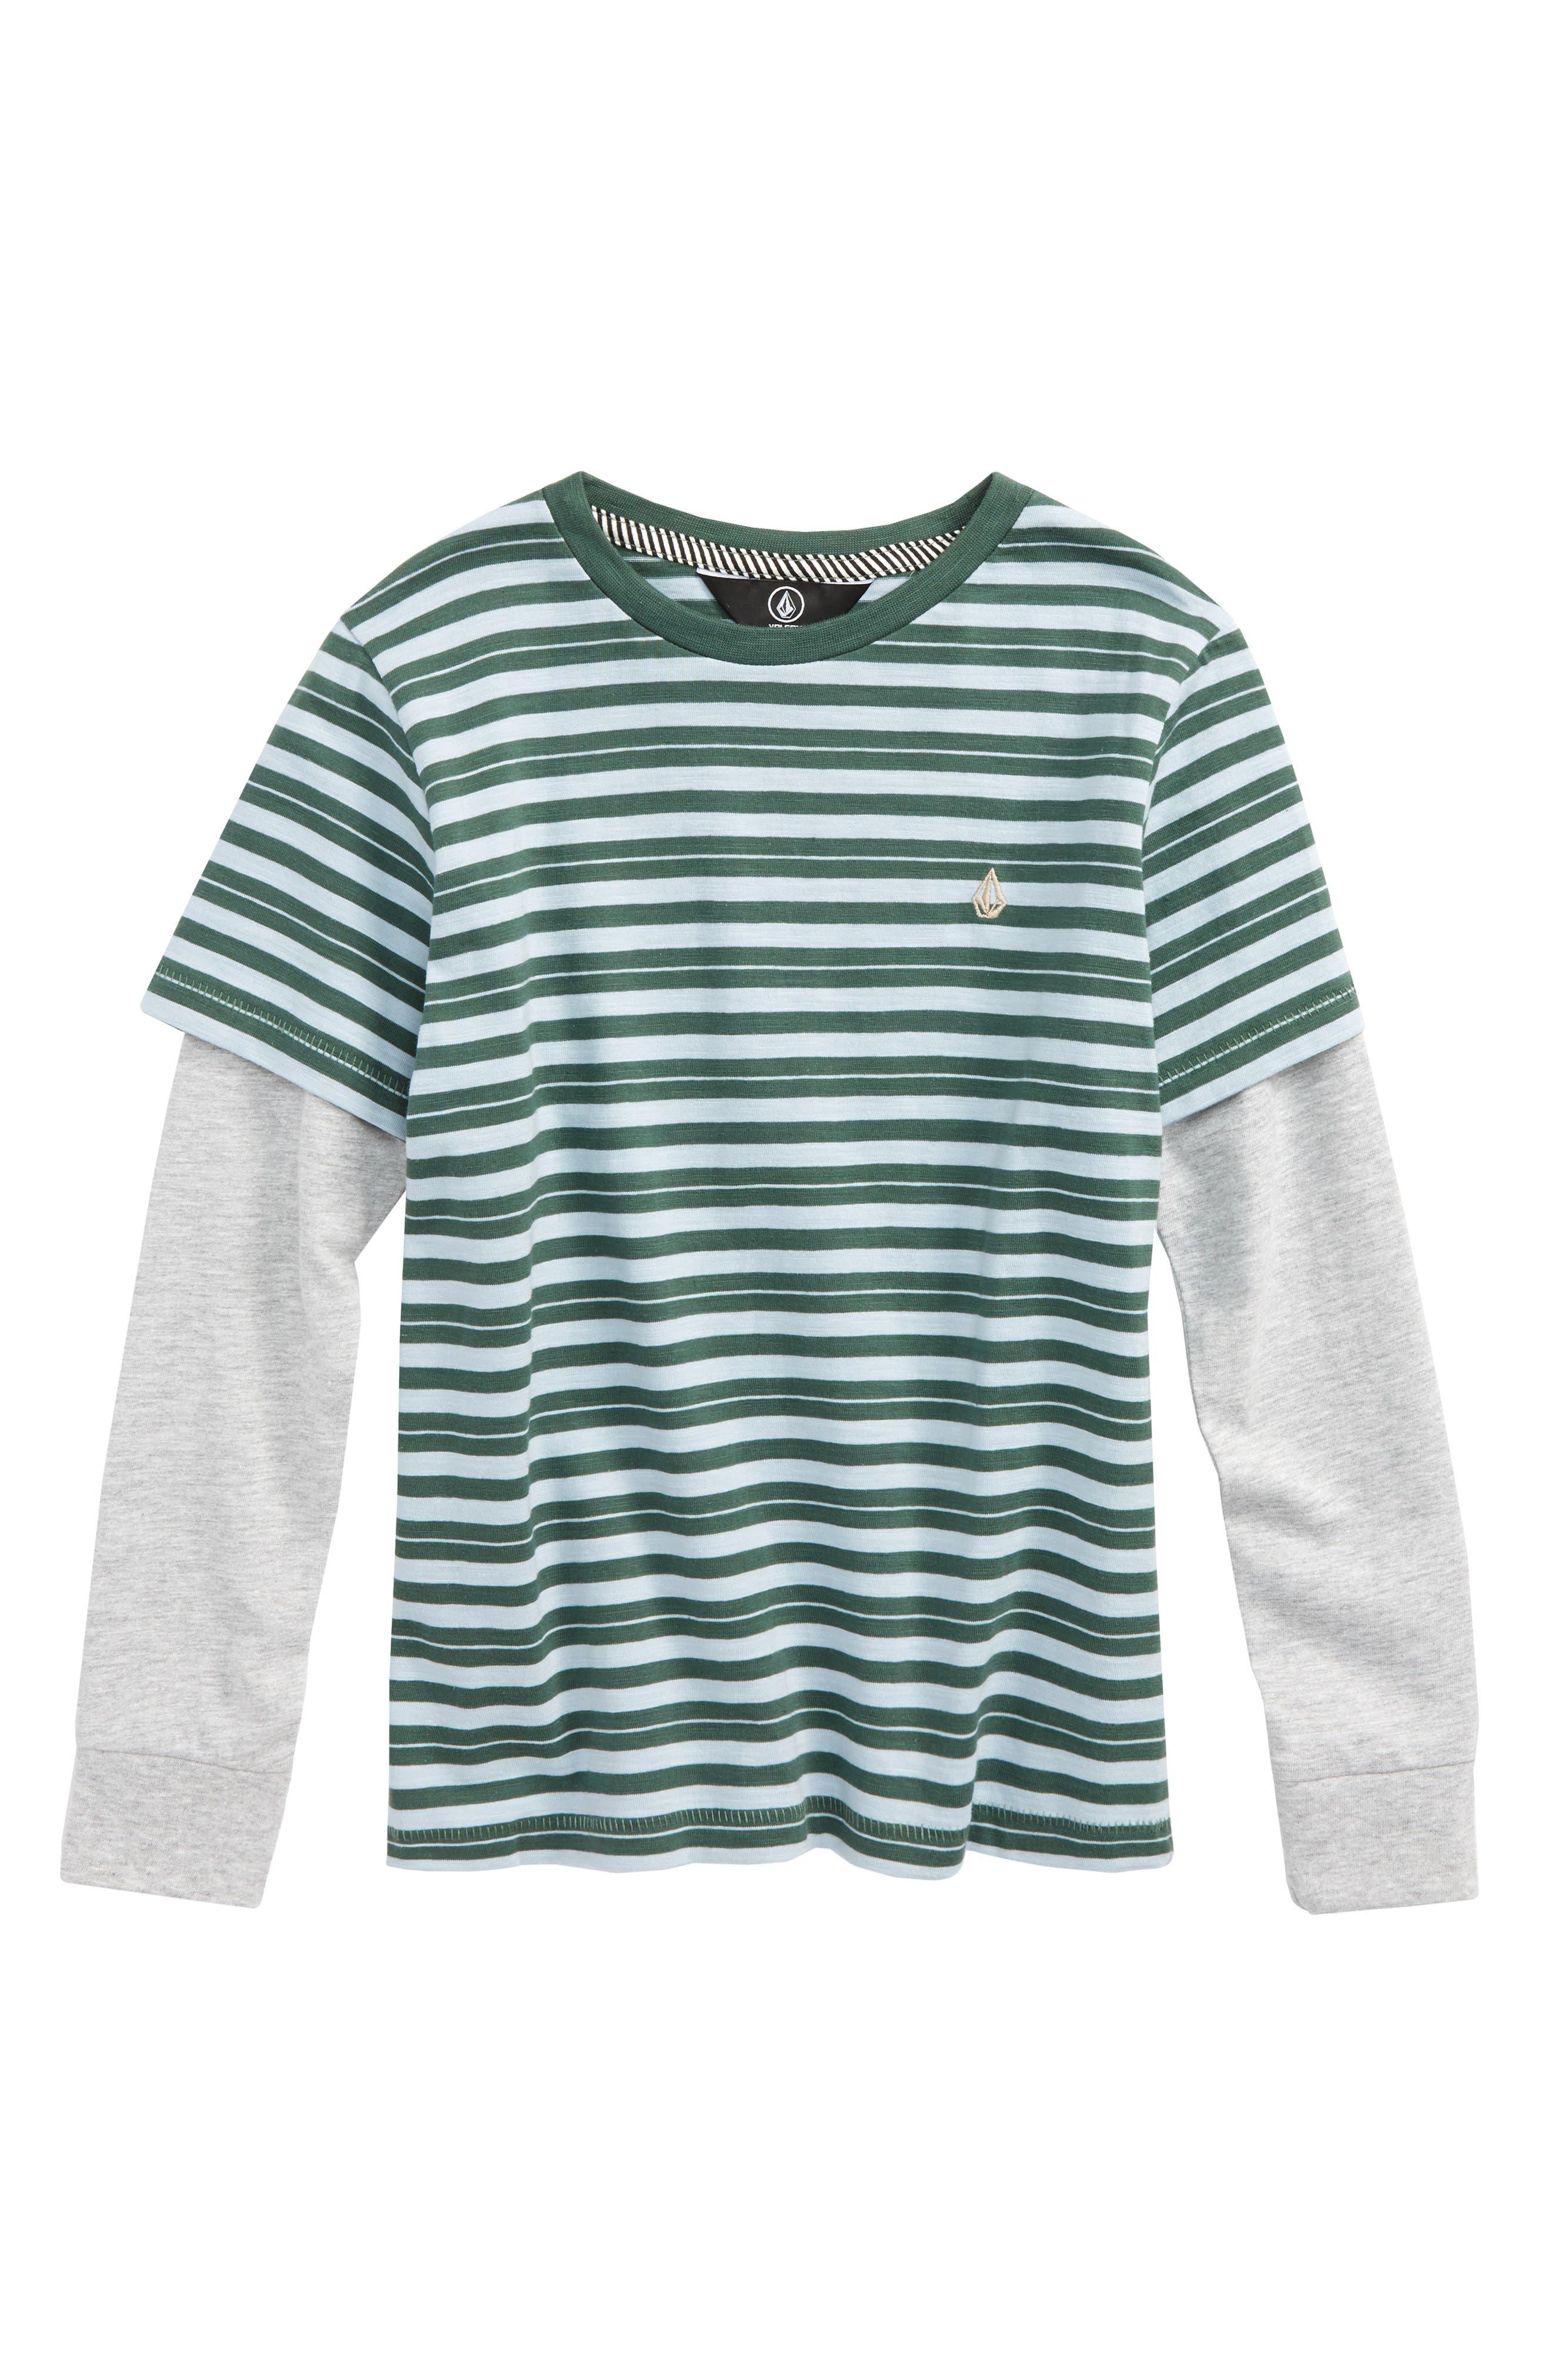 Main Image - Volcom Impact Twofer Layered T-Shirt (Toddler Boys & Little Boys)